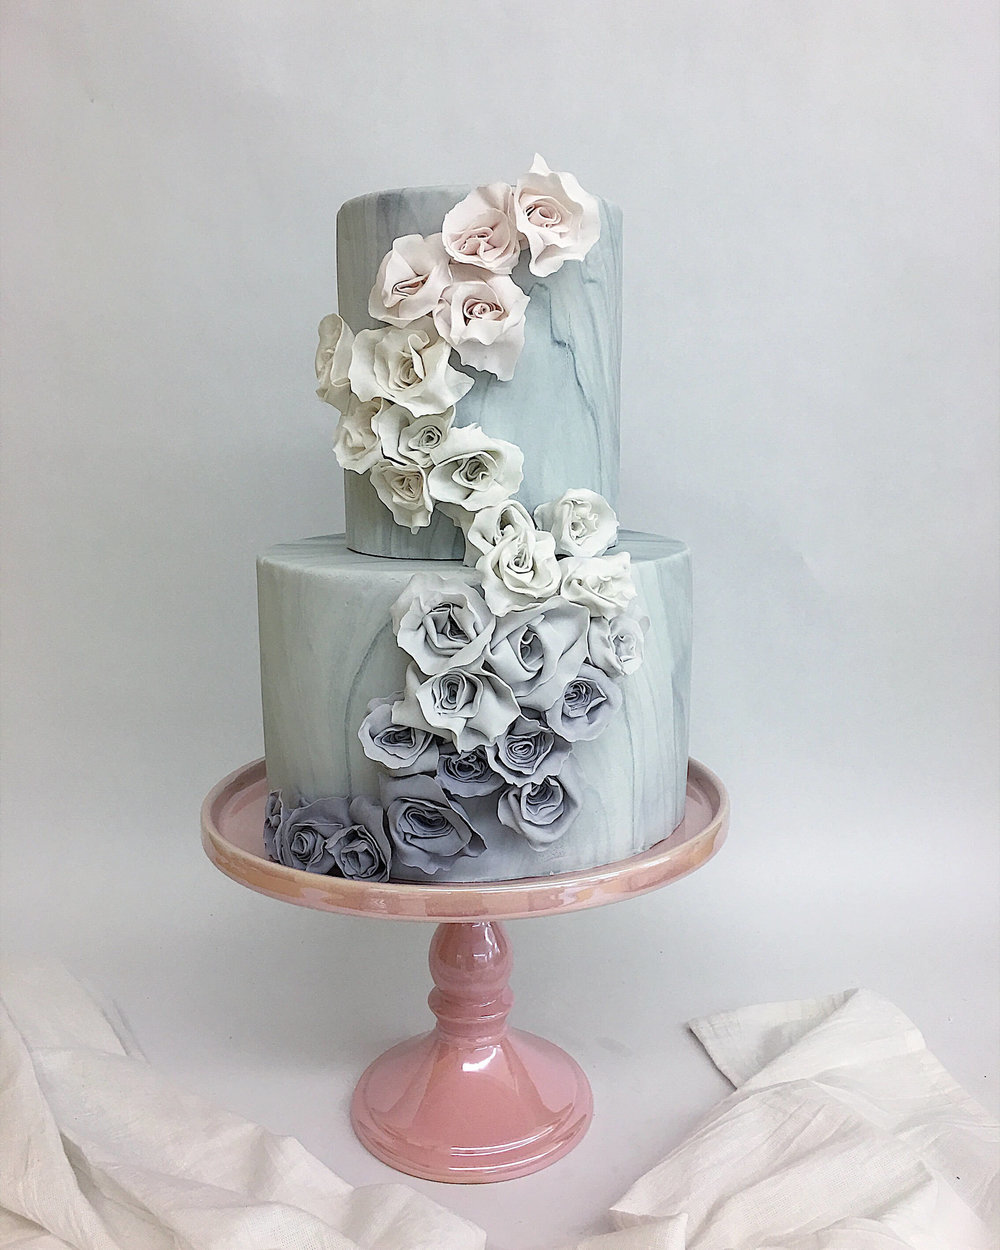 marble effect fondant rosettes tiered wedding cake.jpg